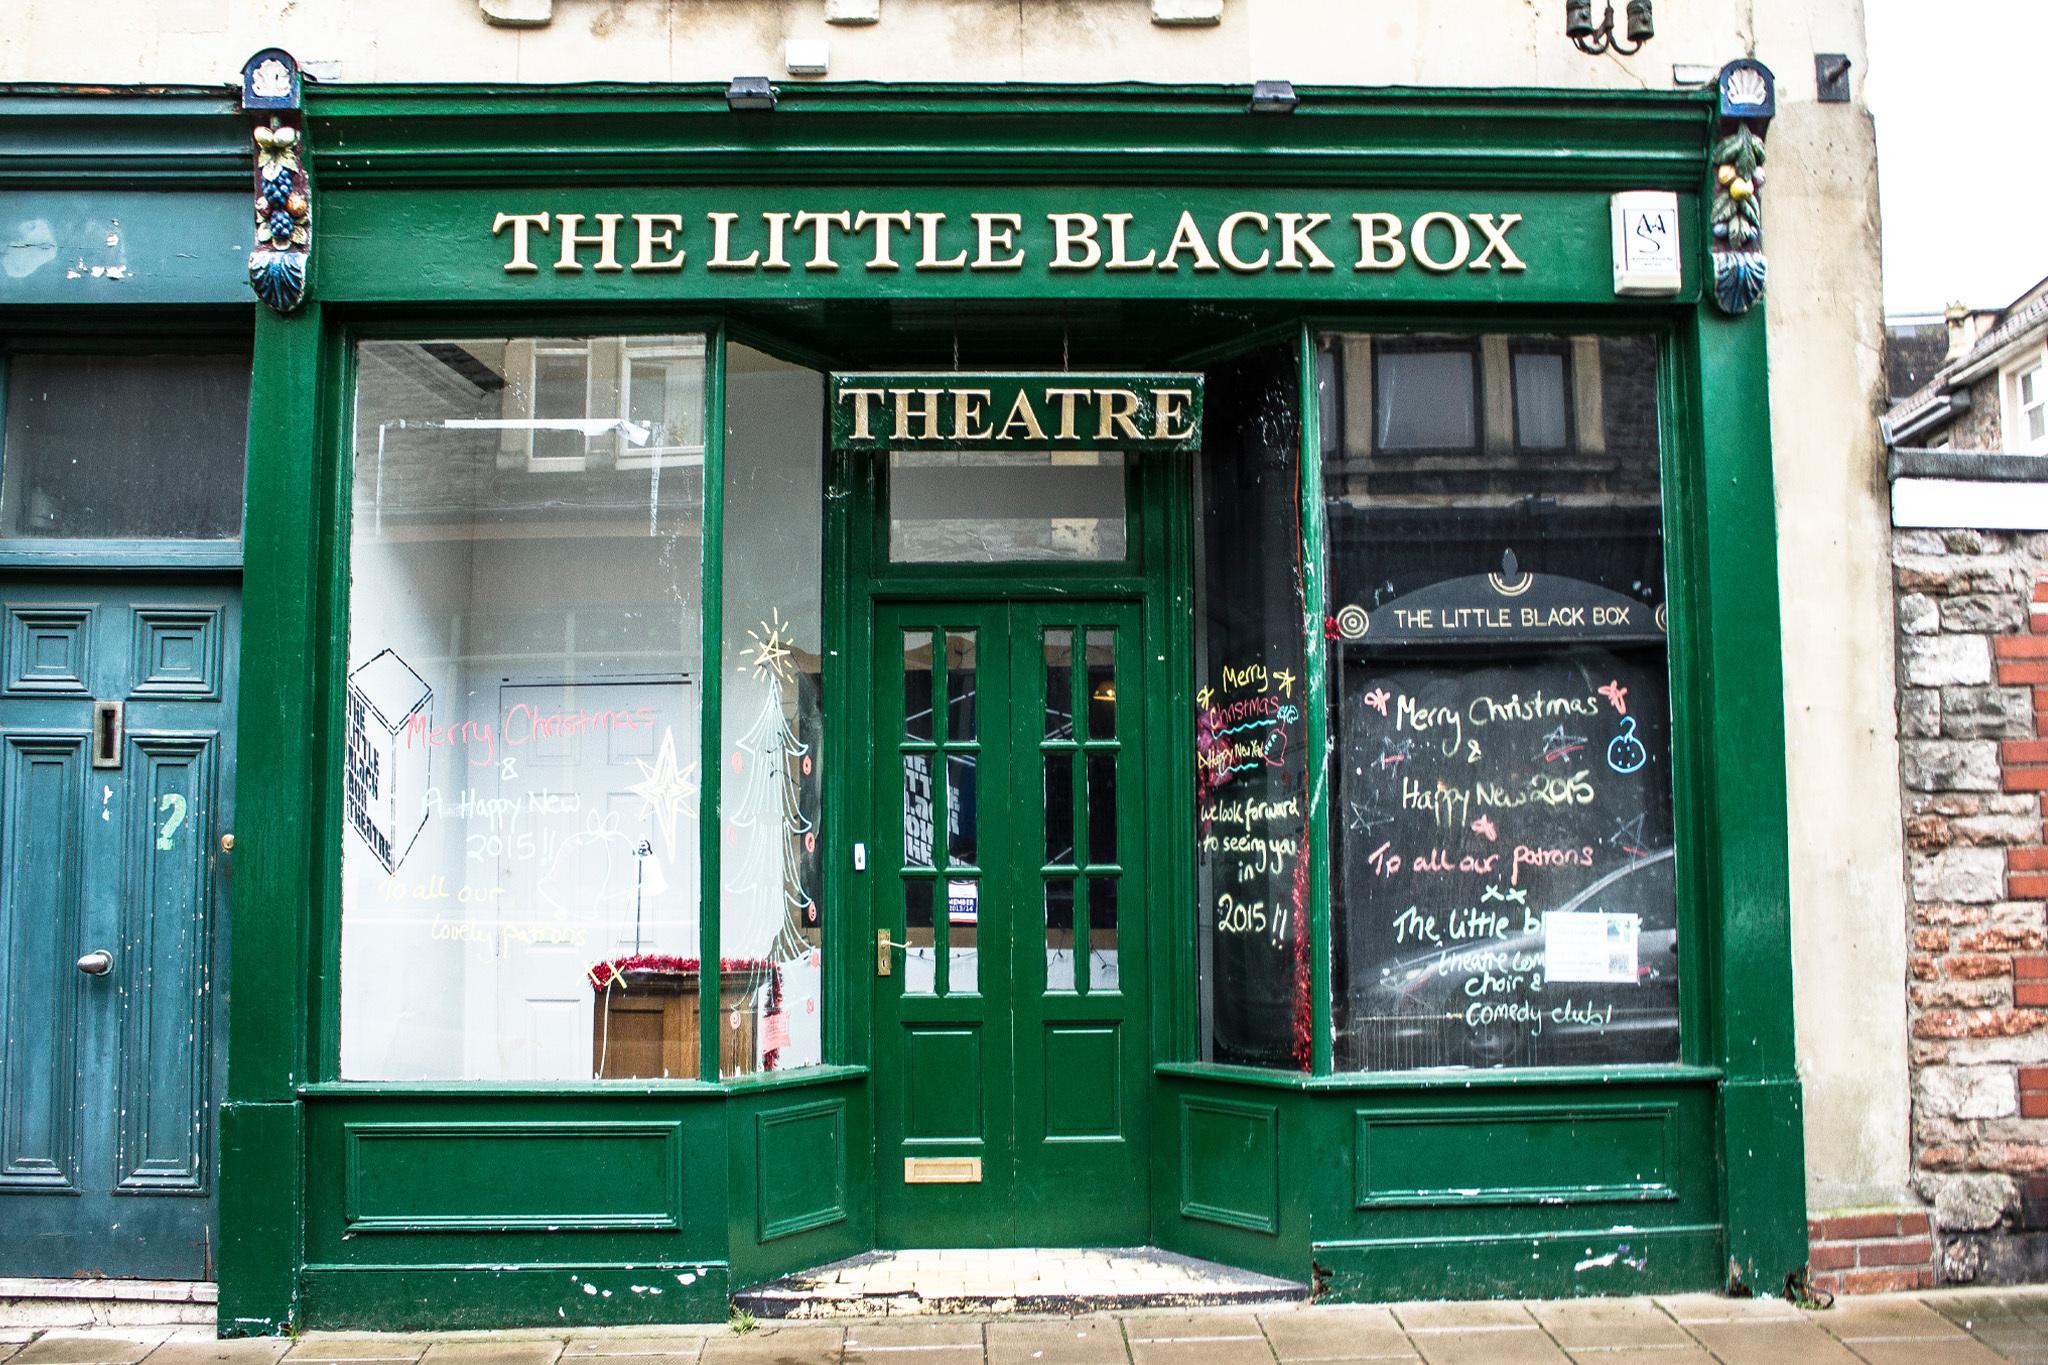 The Little Black Box Theatre, Cotham, Bristol